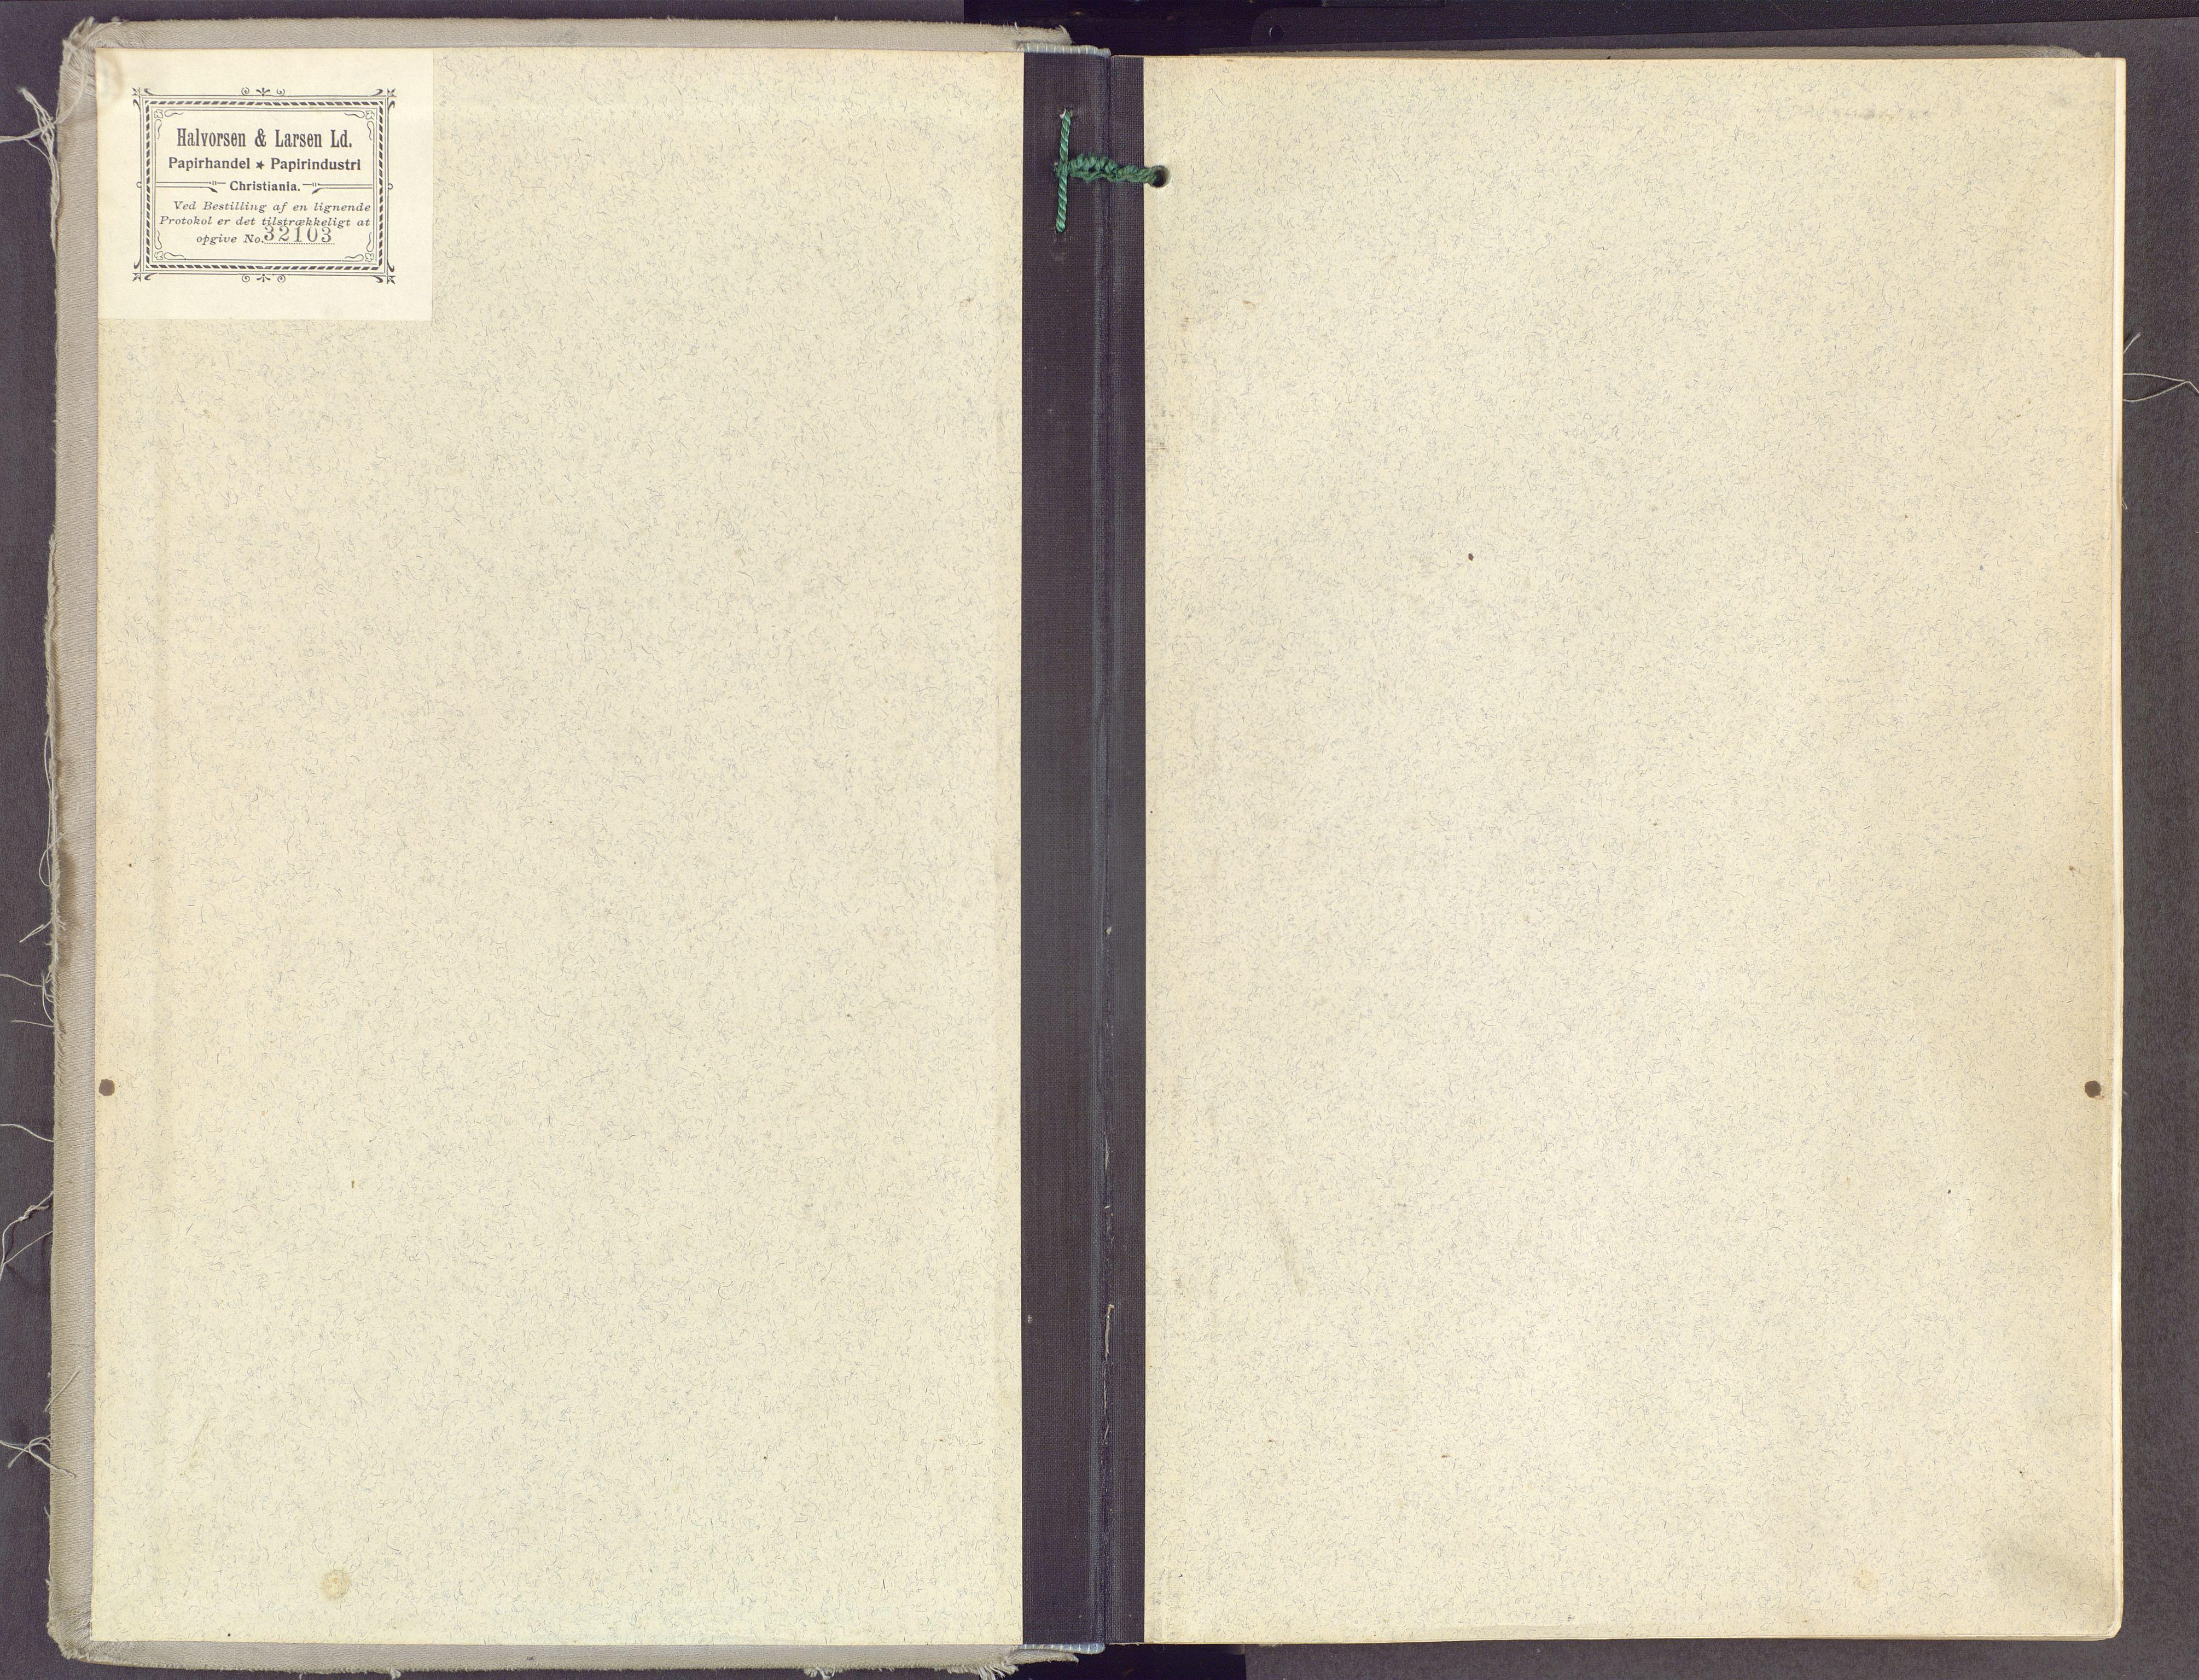 SAH, Gran prestekontor, Ministerialbok nr. 23, 1919-1938